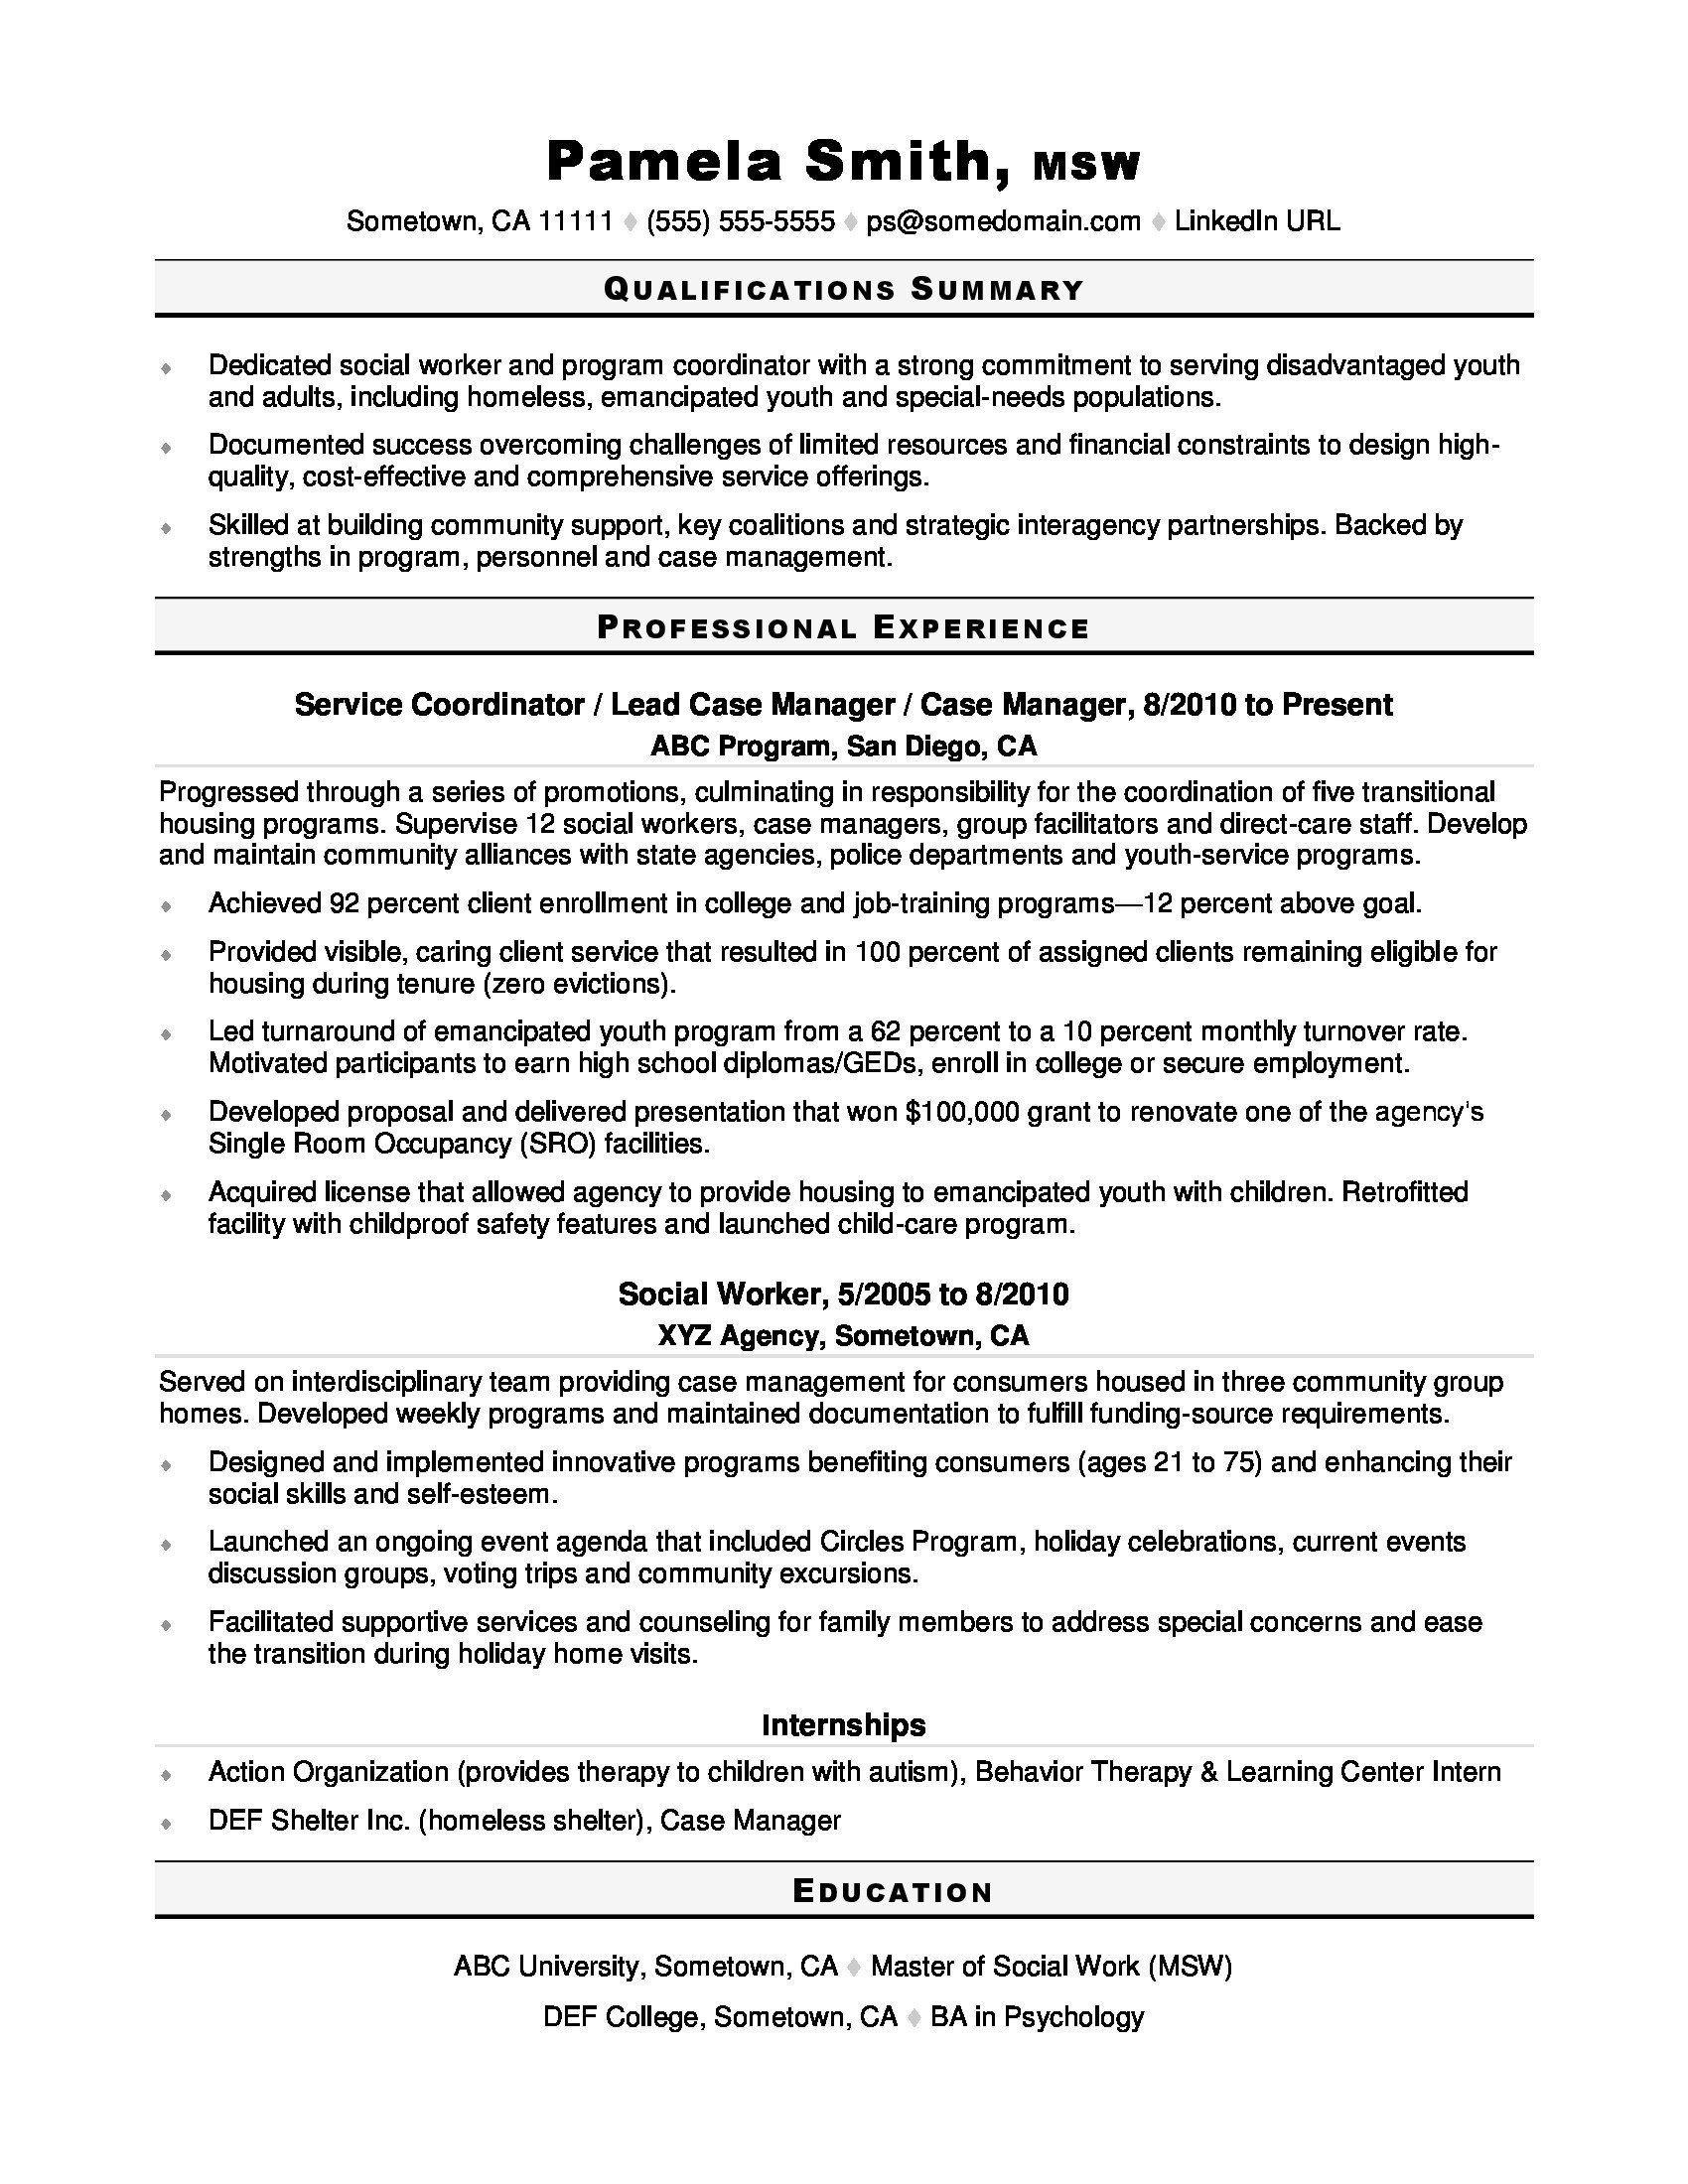 Resume Objectives for Internships Fresh Awesome Job